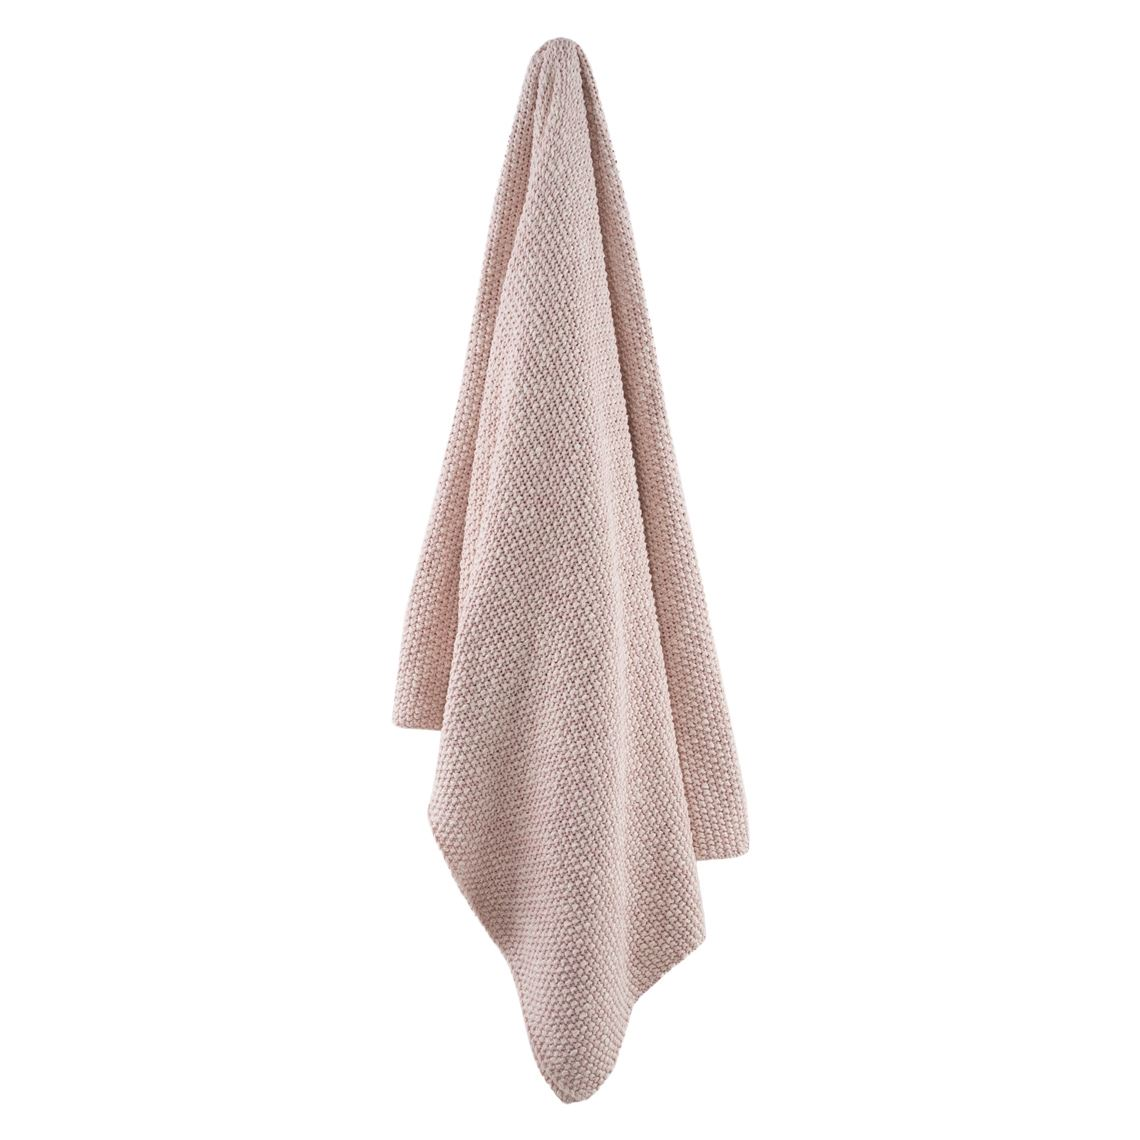 Zeal Throw Size W 130cm x D 150cm x H 2cm in Pink Freedom